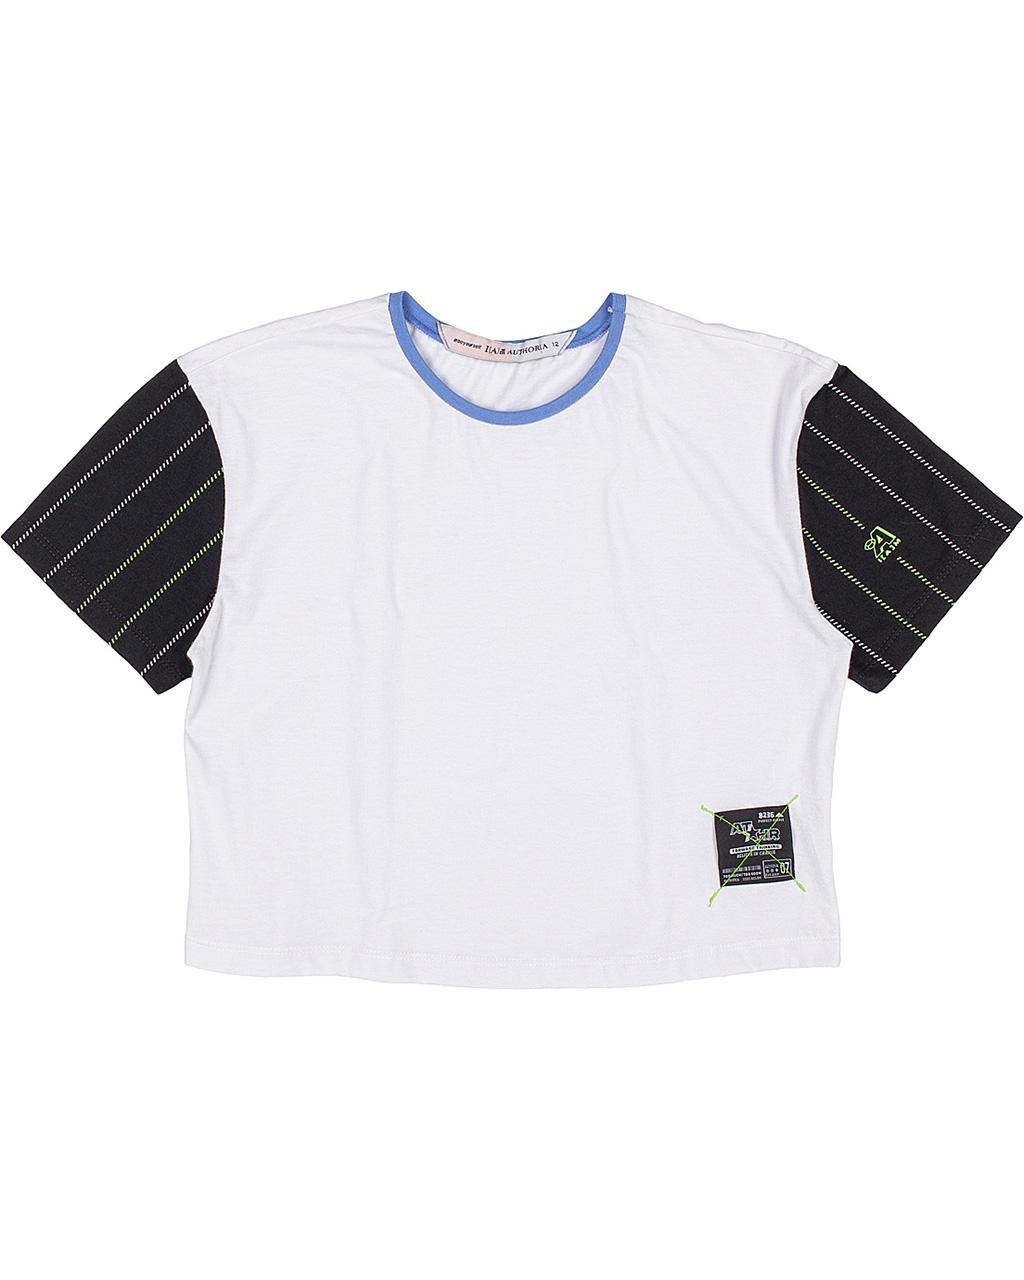 T-Shirt Teen Lisa Detalhe Gola Colorida Off White I Am